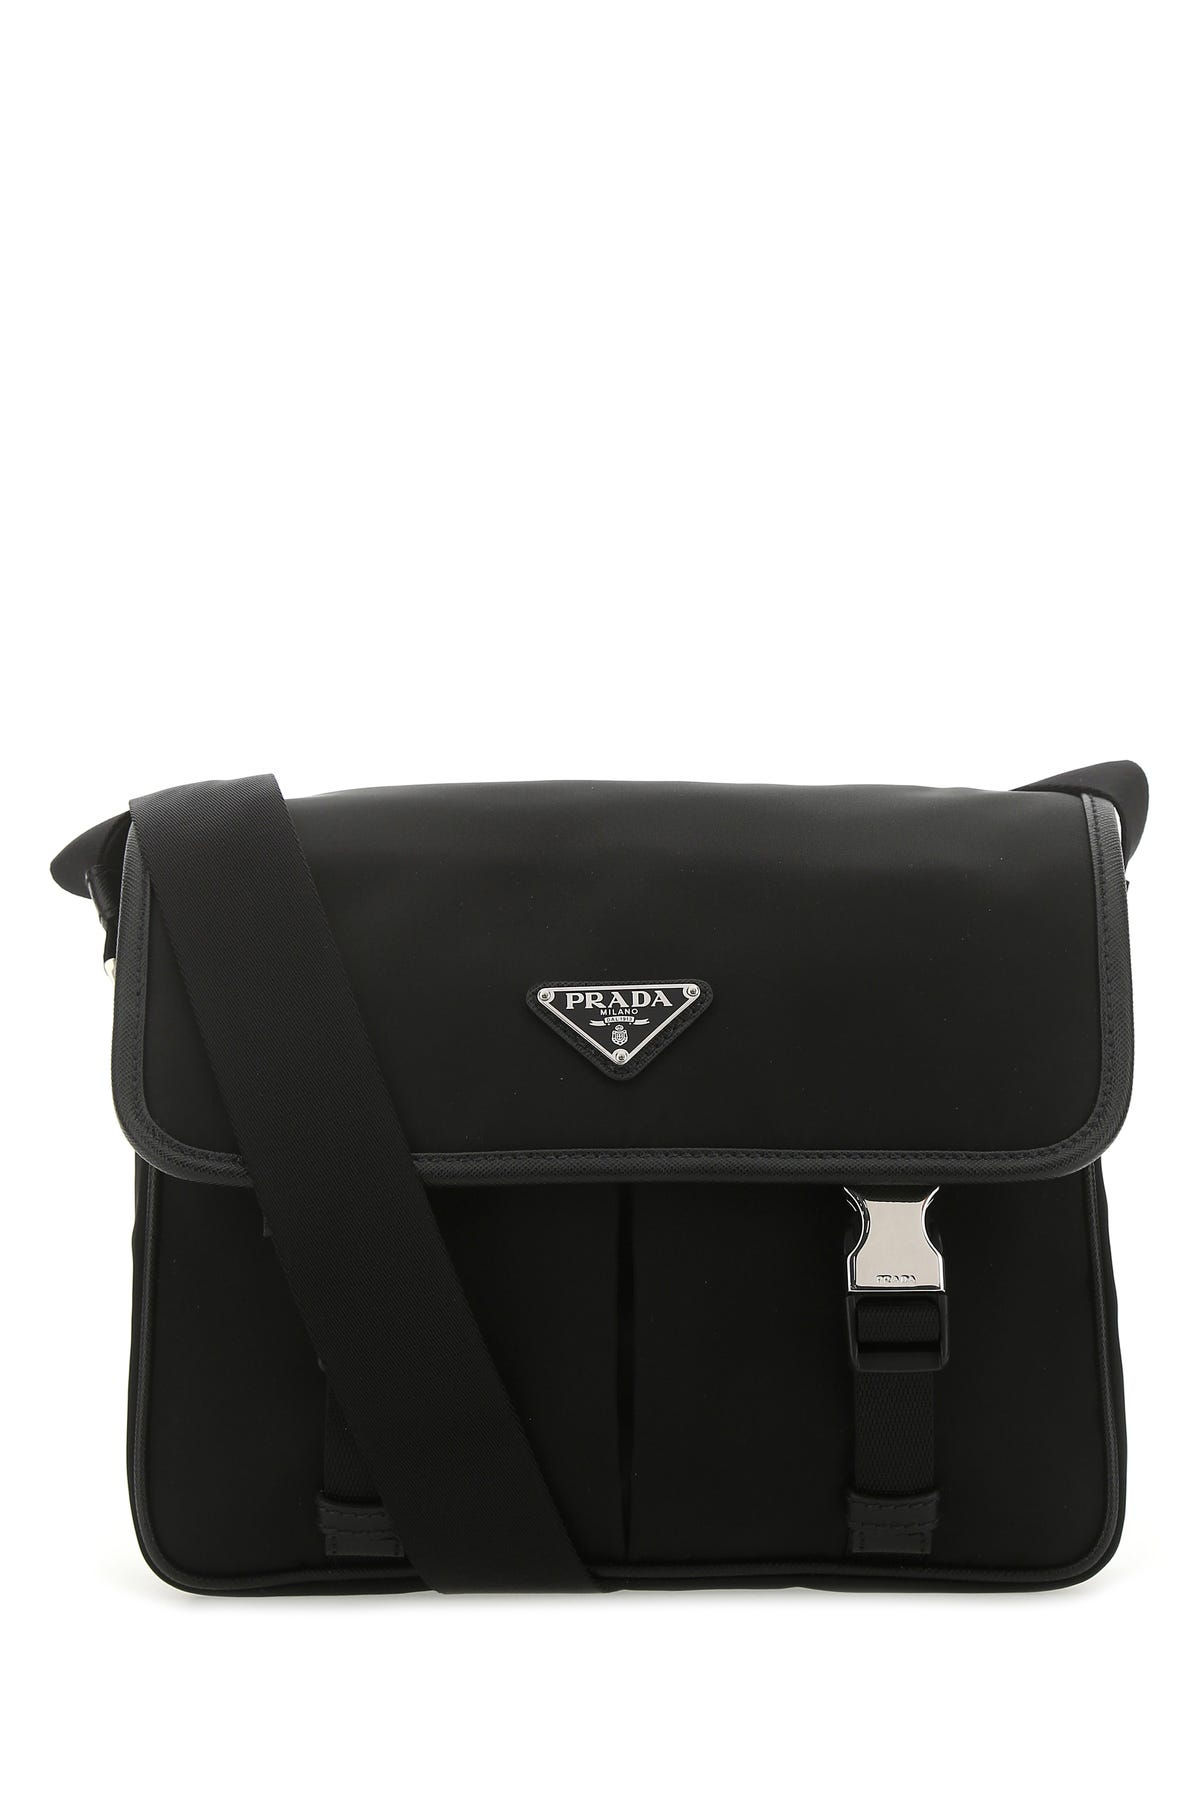 Prada Black Re-nylon Crossbody Bag  Nd  Uomo Tu